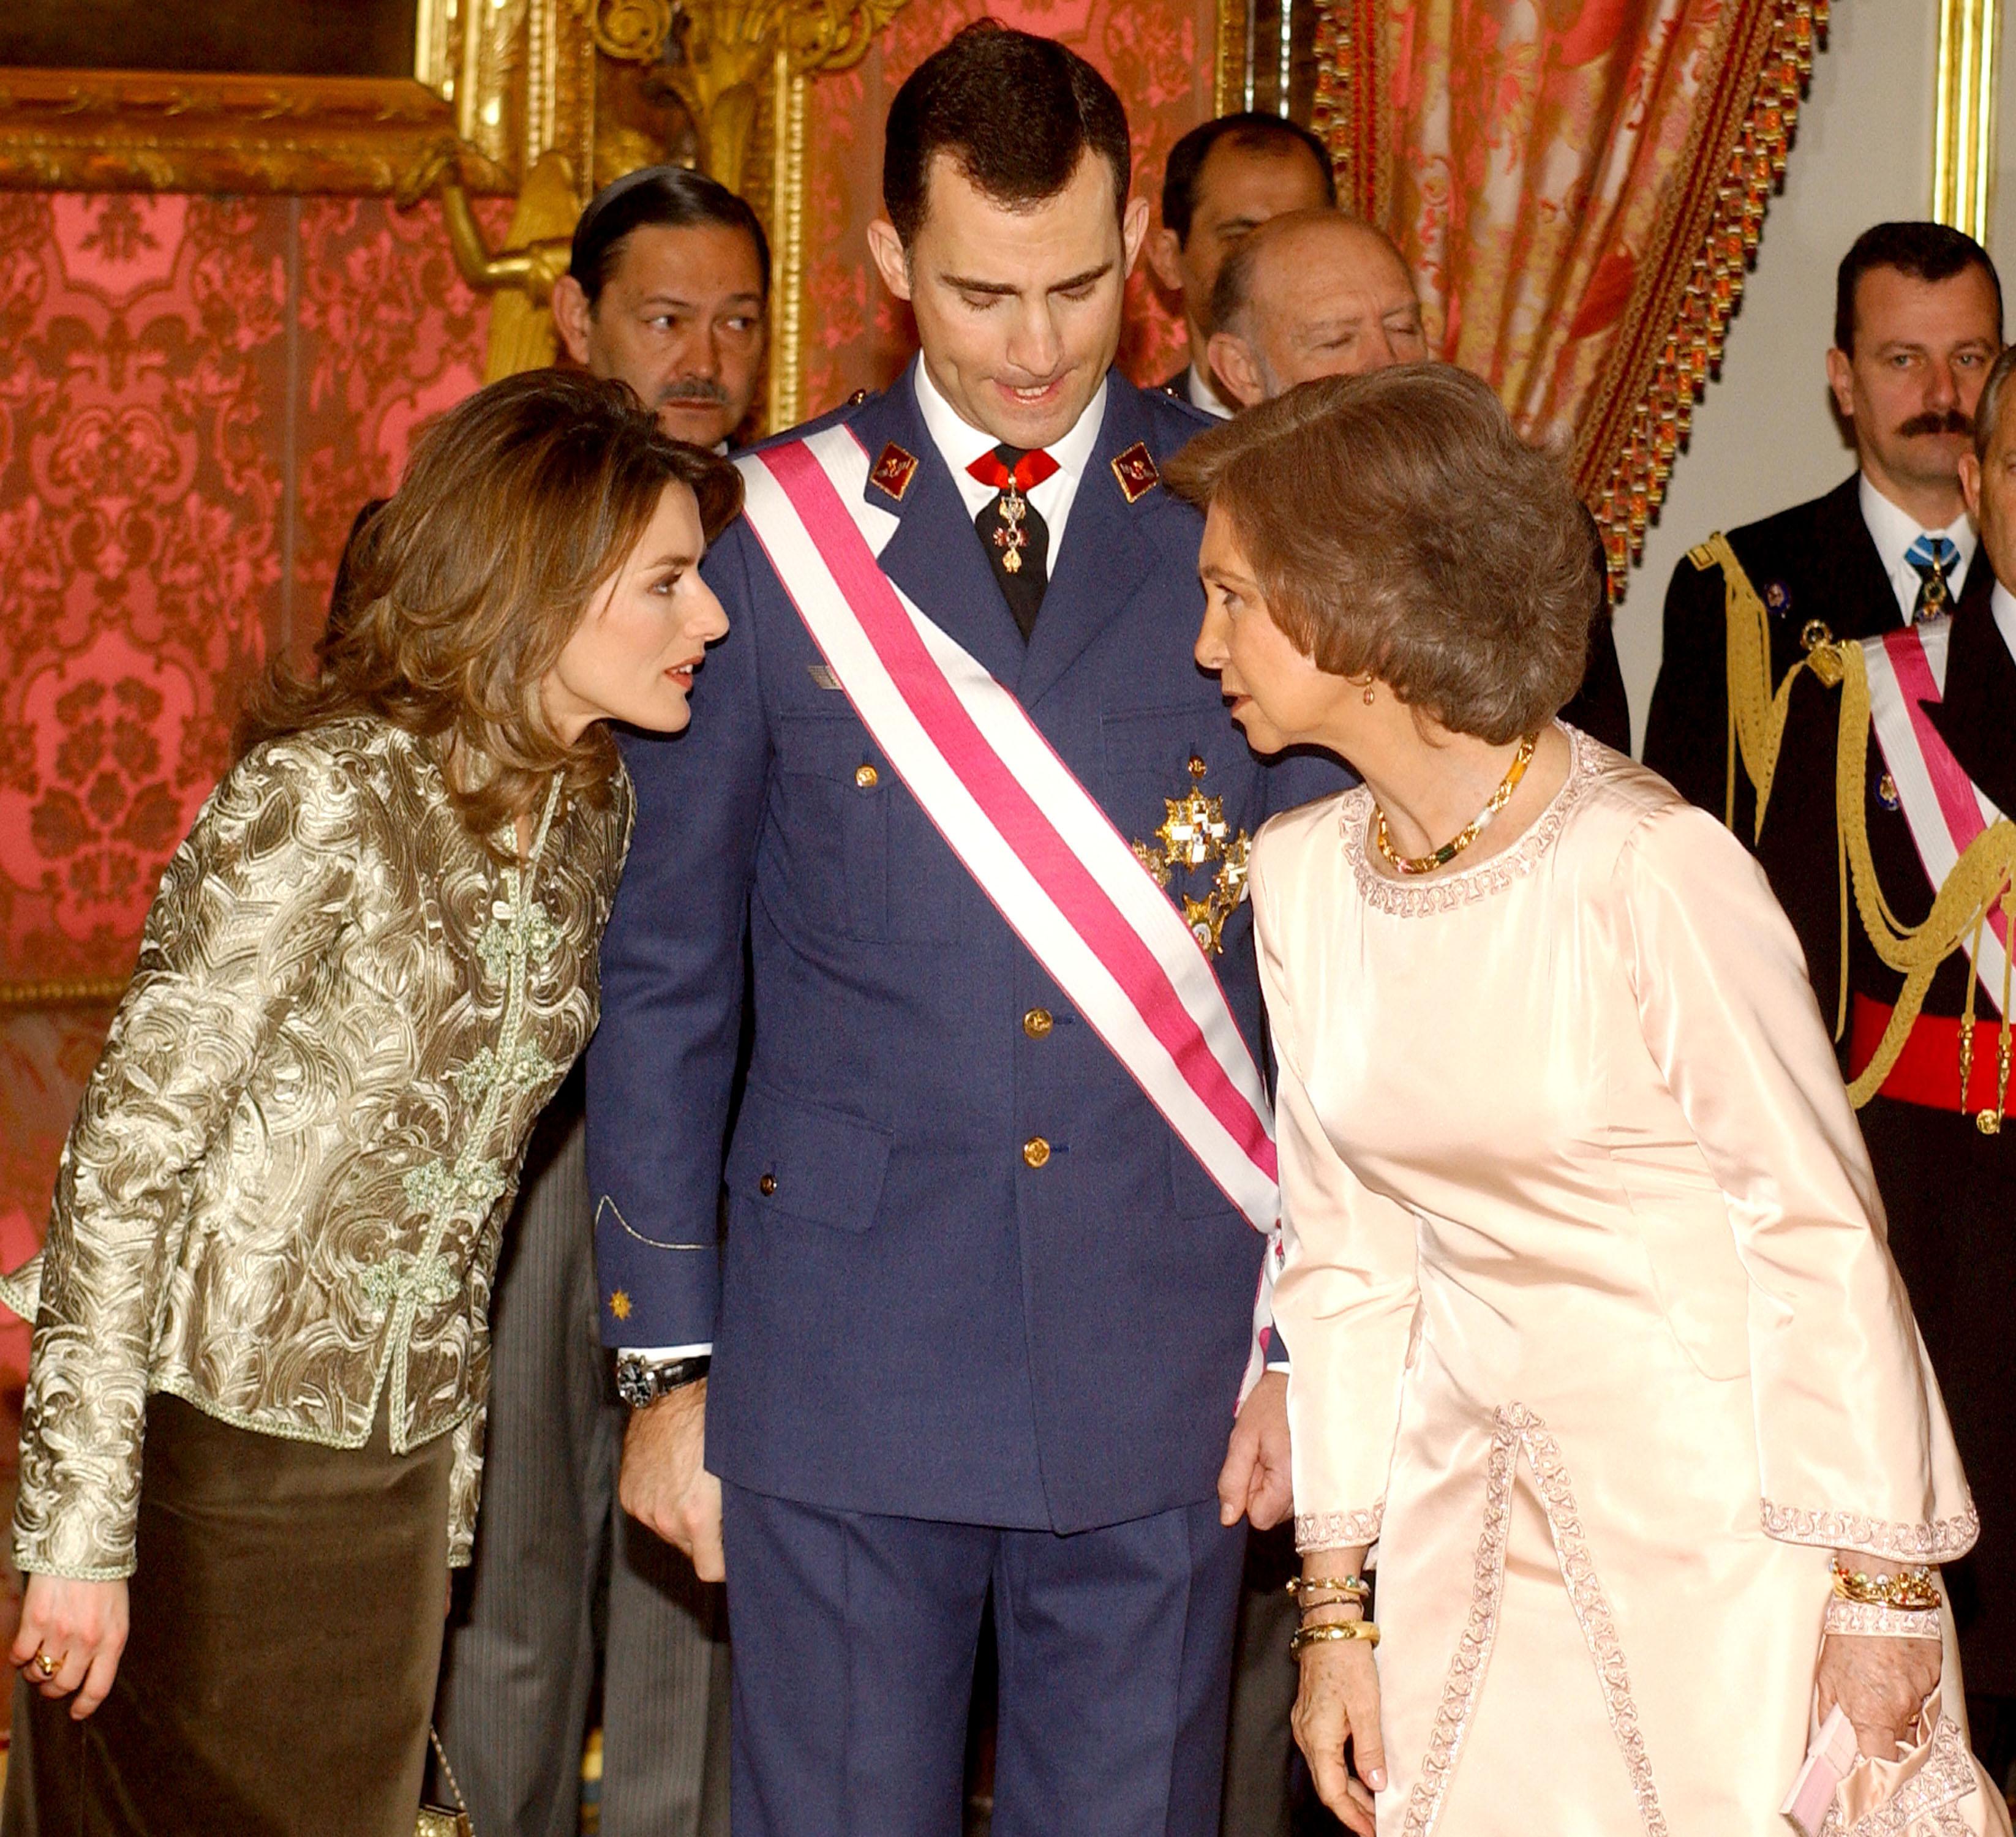 La reina Letizia y la reina Sofía